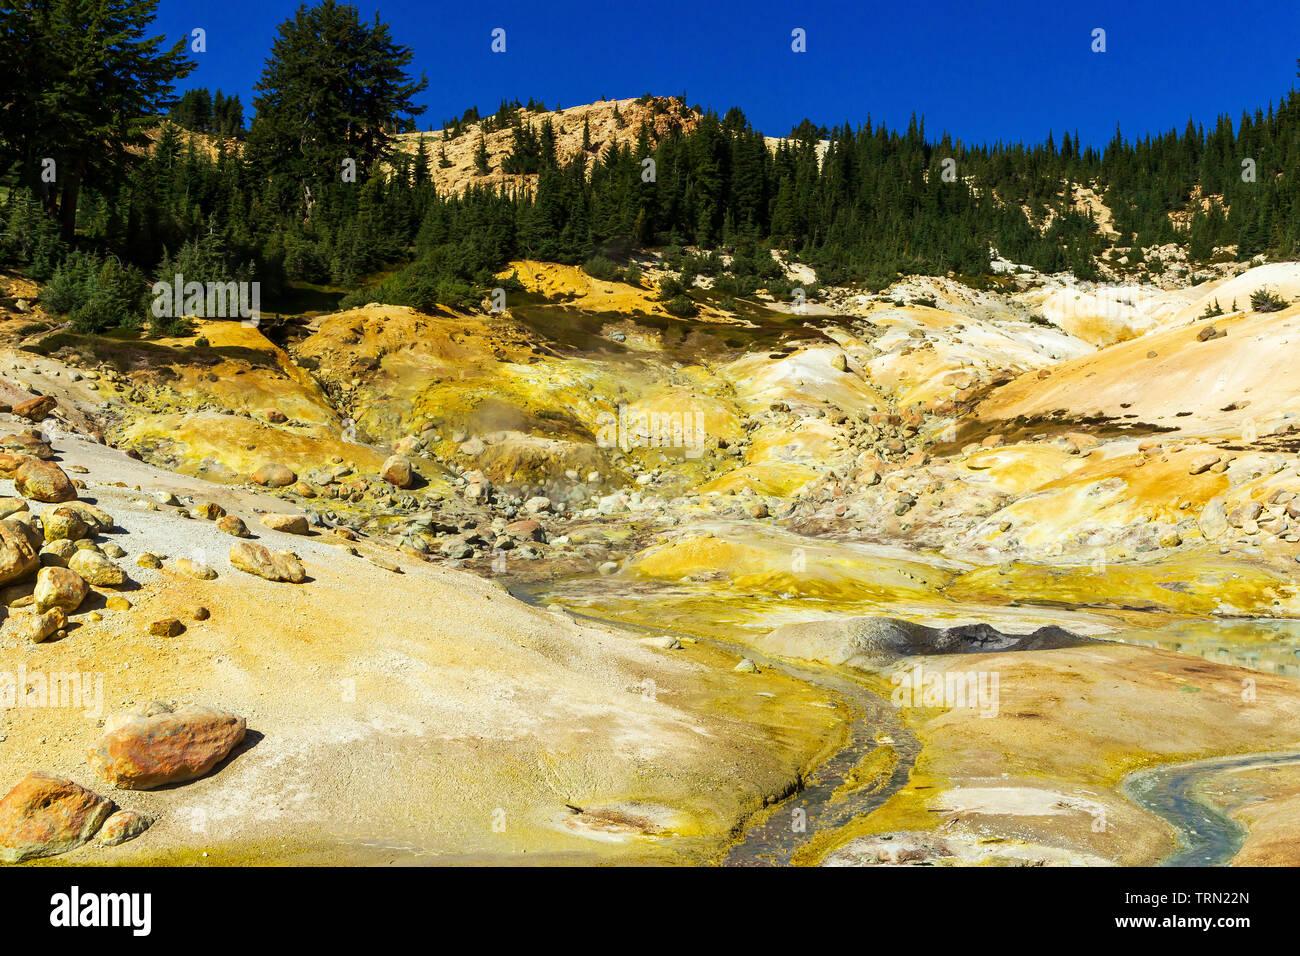 Thermal Pool in Bumpas Hell, Lassen Volcanic National Park, California - Stock Image